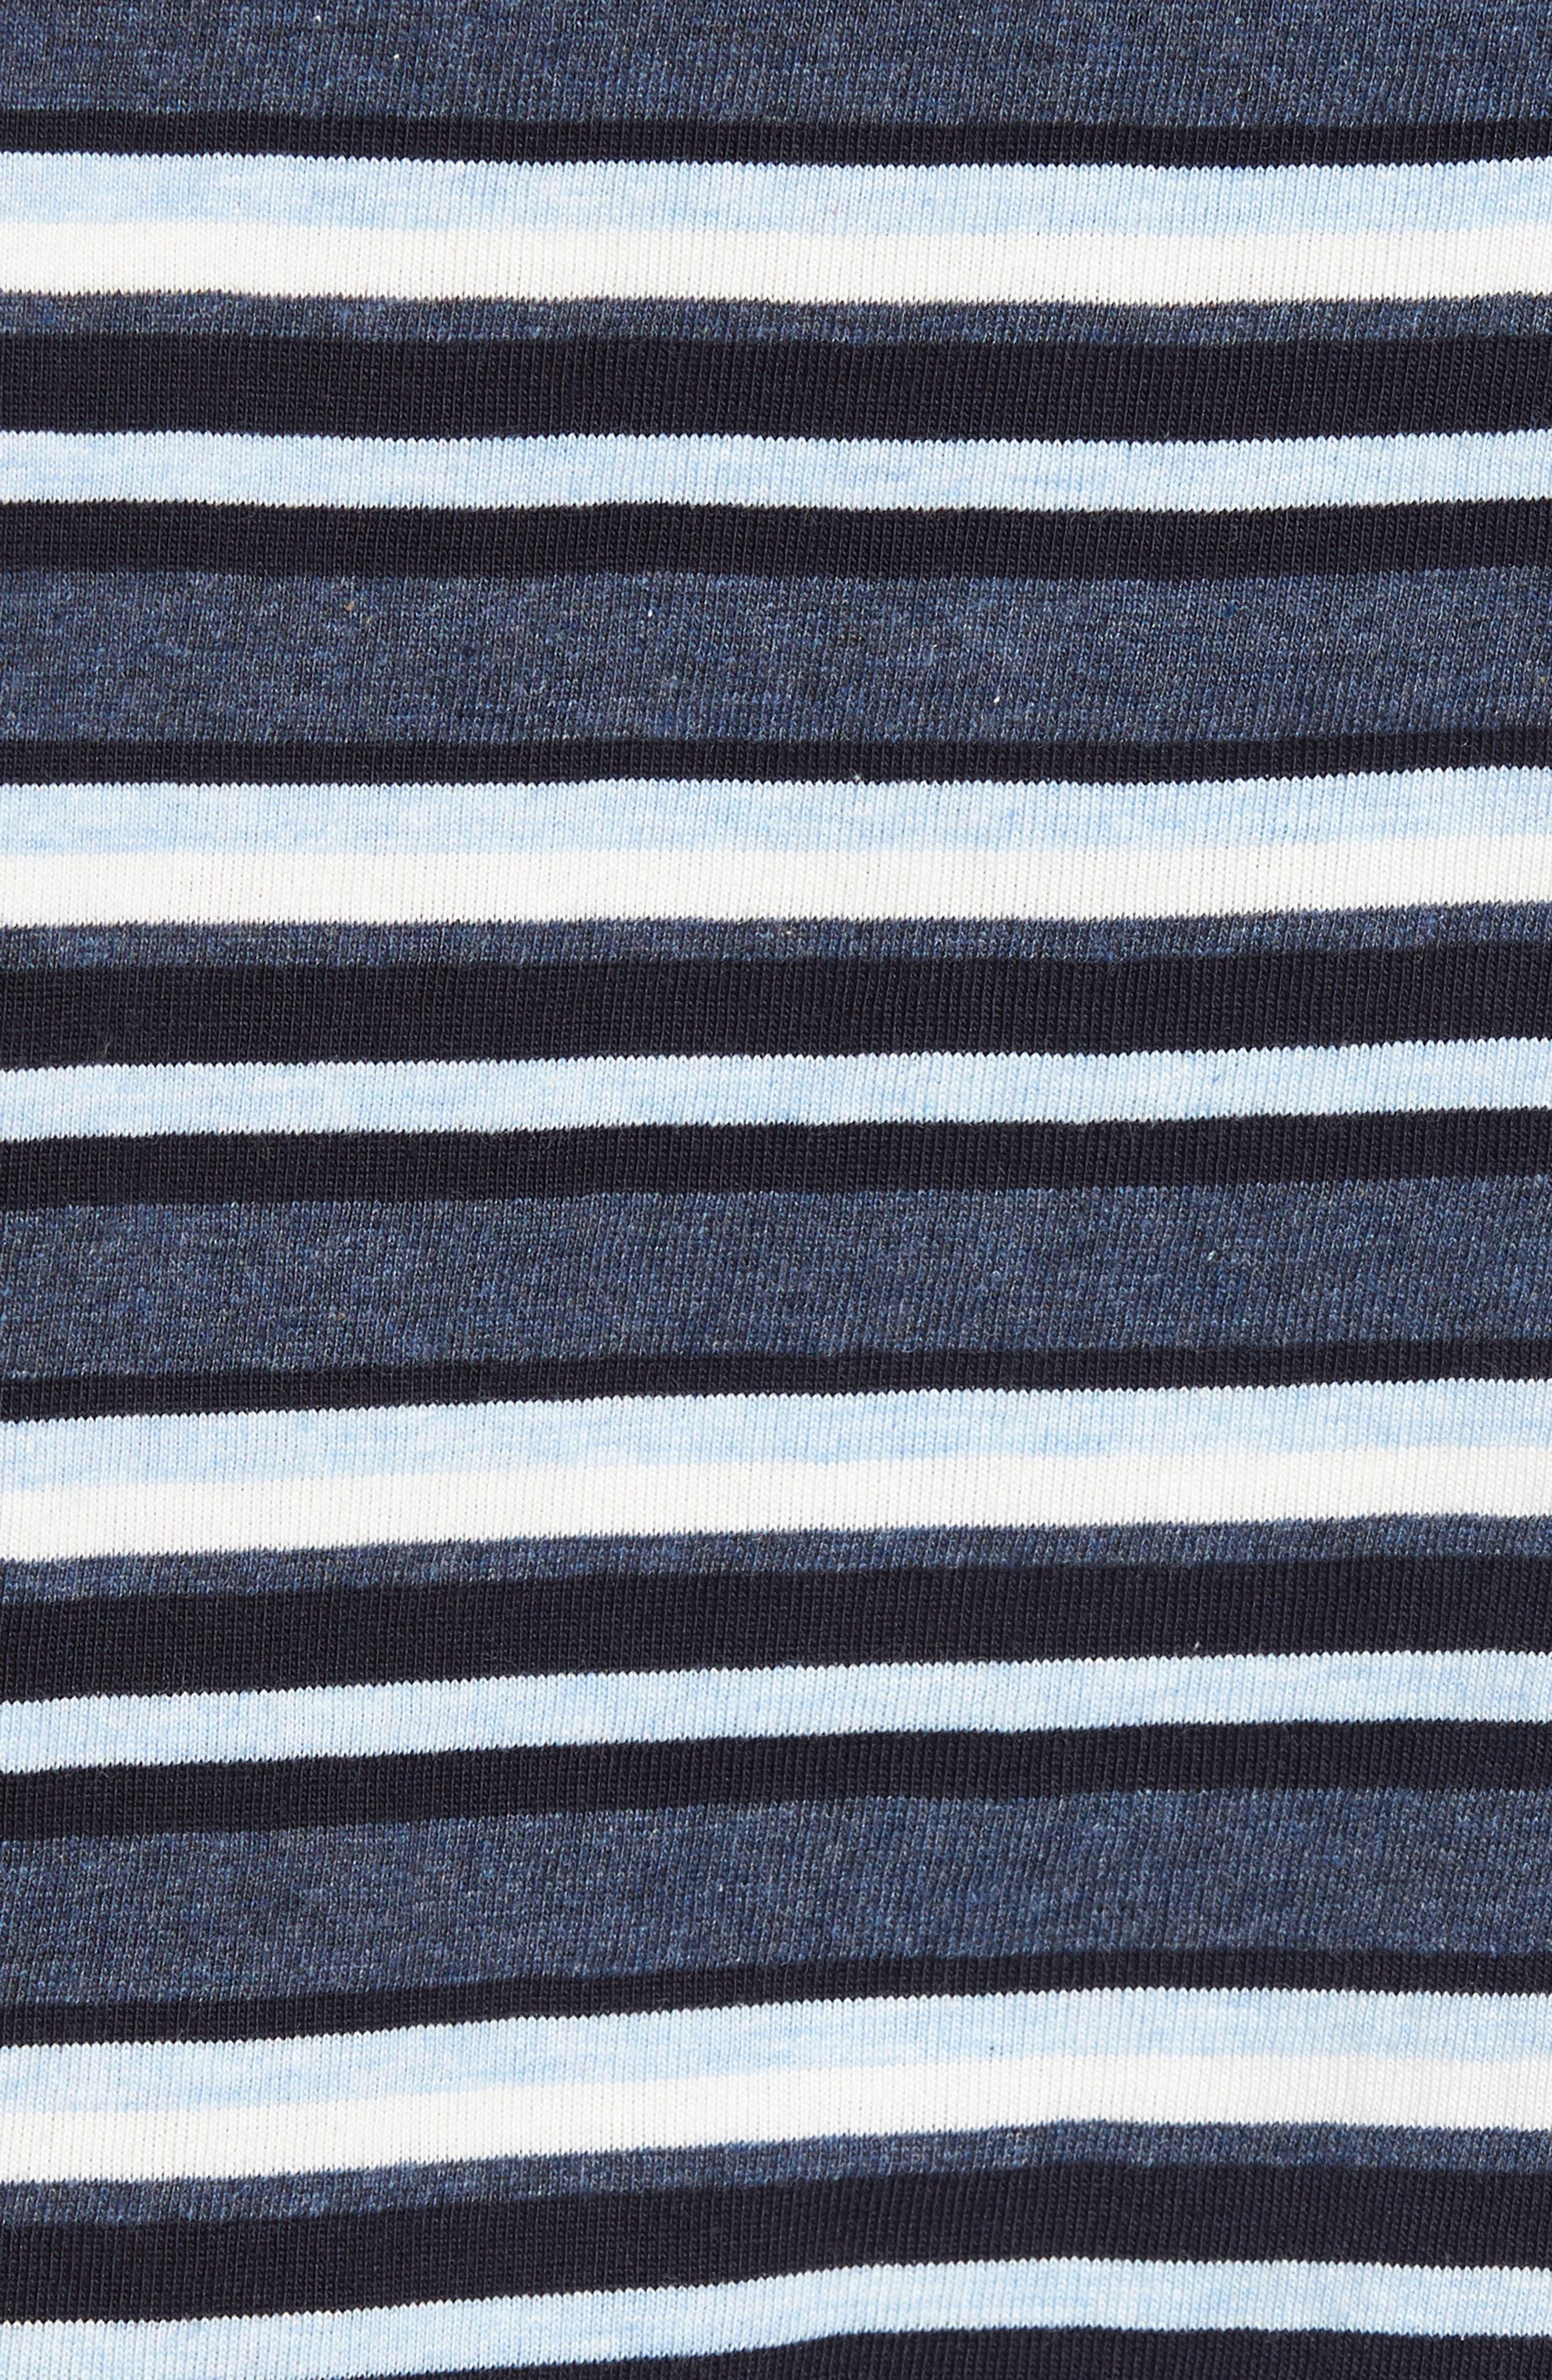 Majetic International Sleep On It Pajama Set,                             Alternate thumbnail 5, color,                             Alfresco Stripe